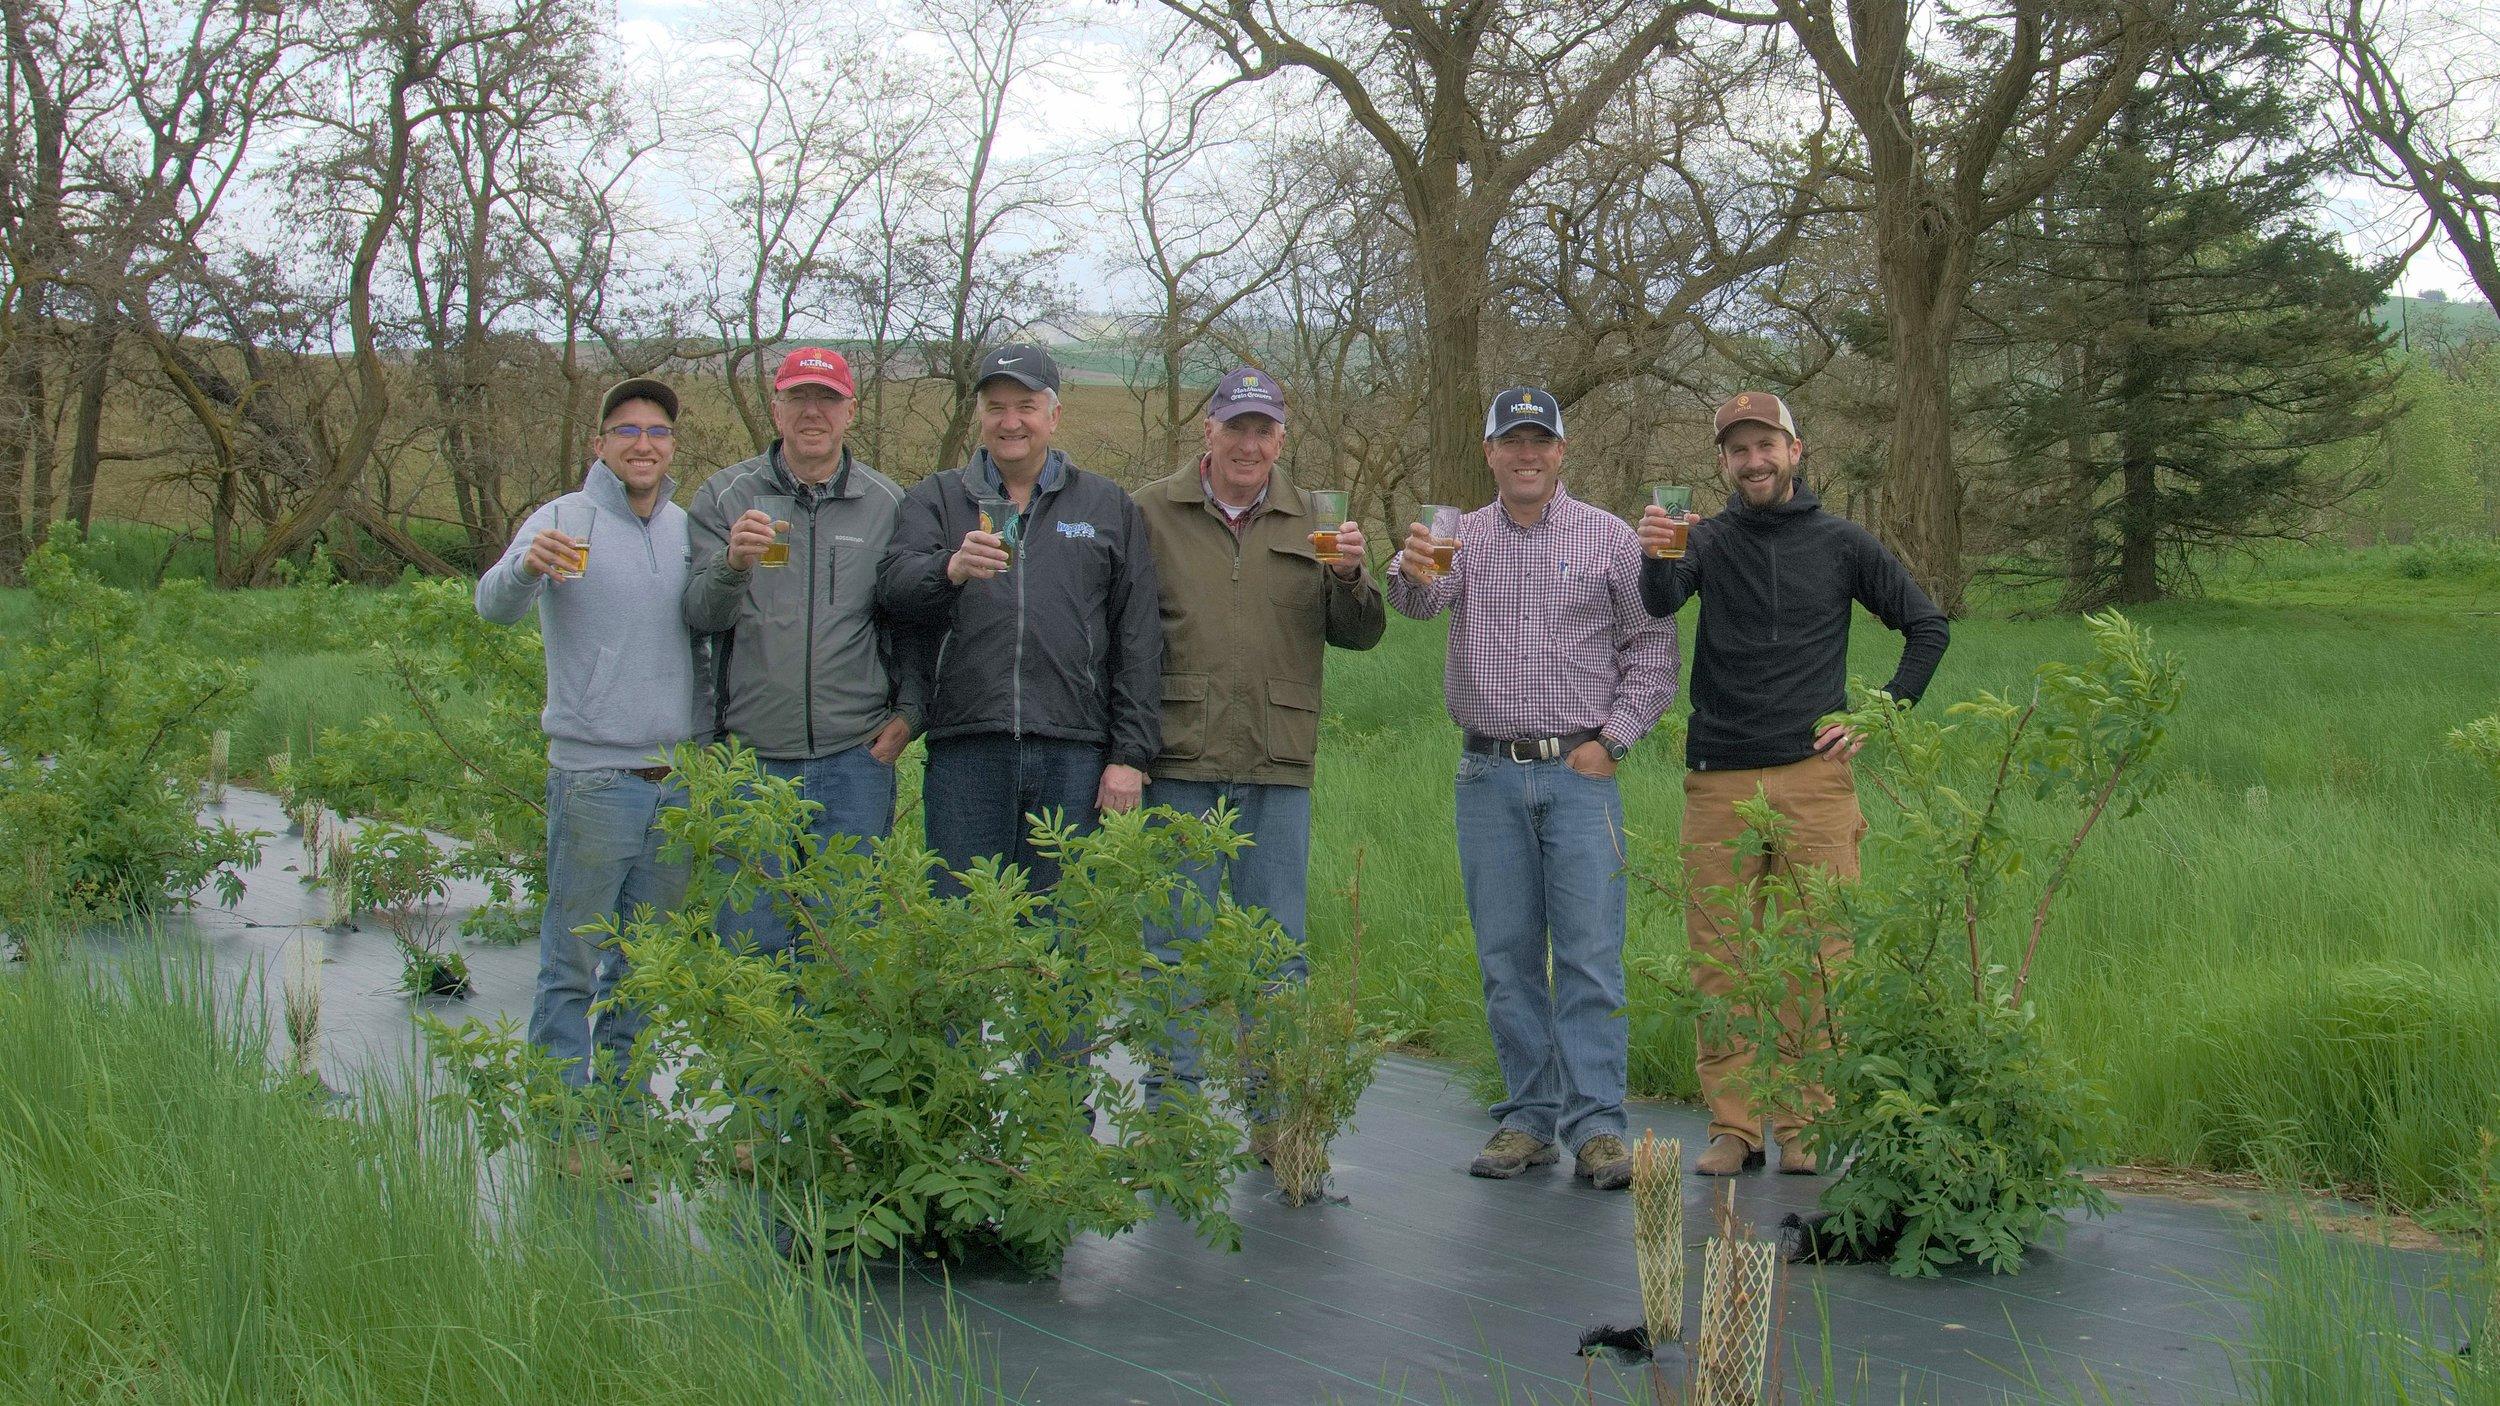 Celebrating Conservation, 4/22